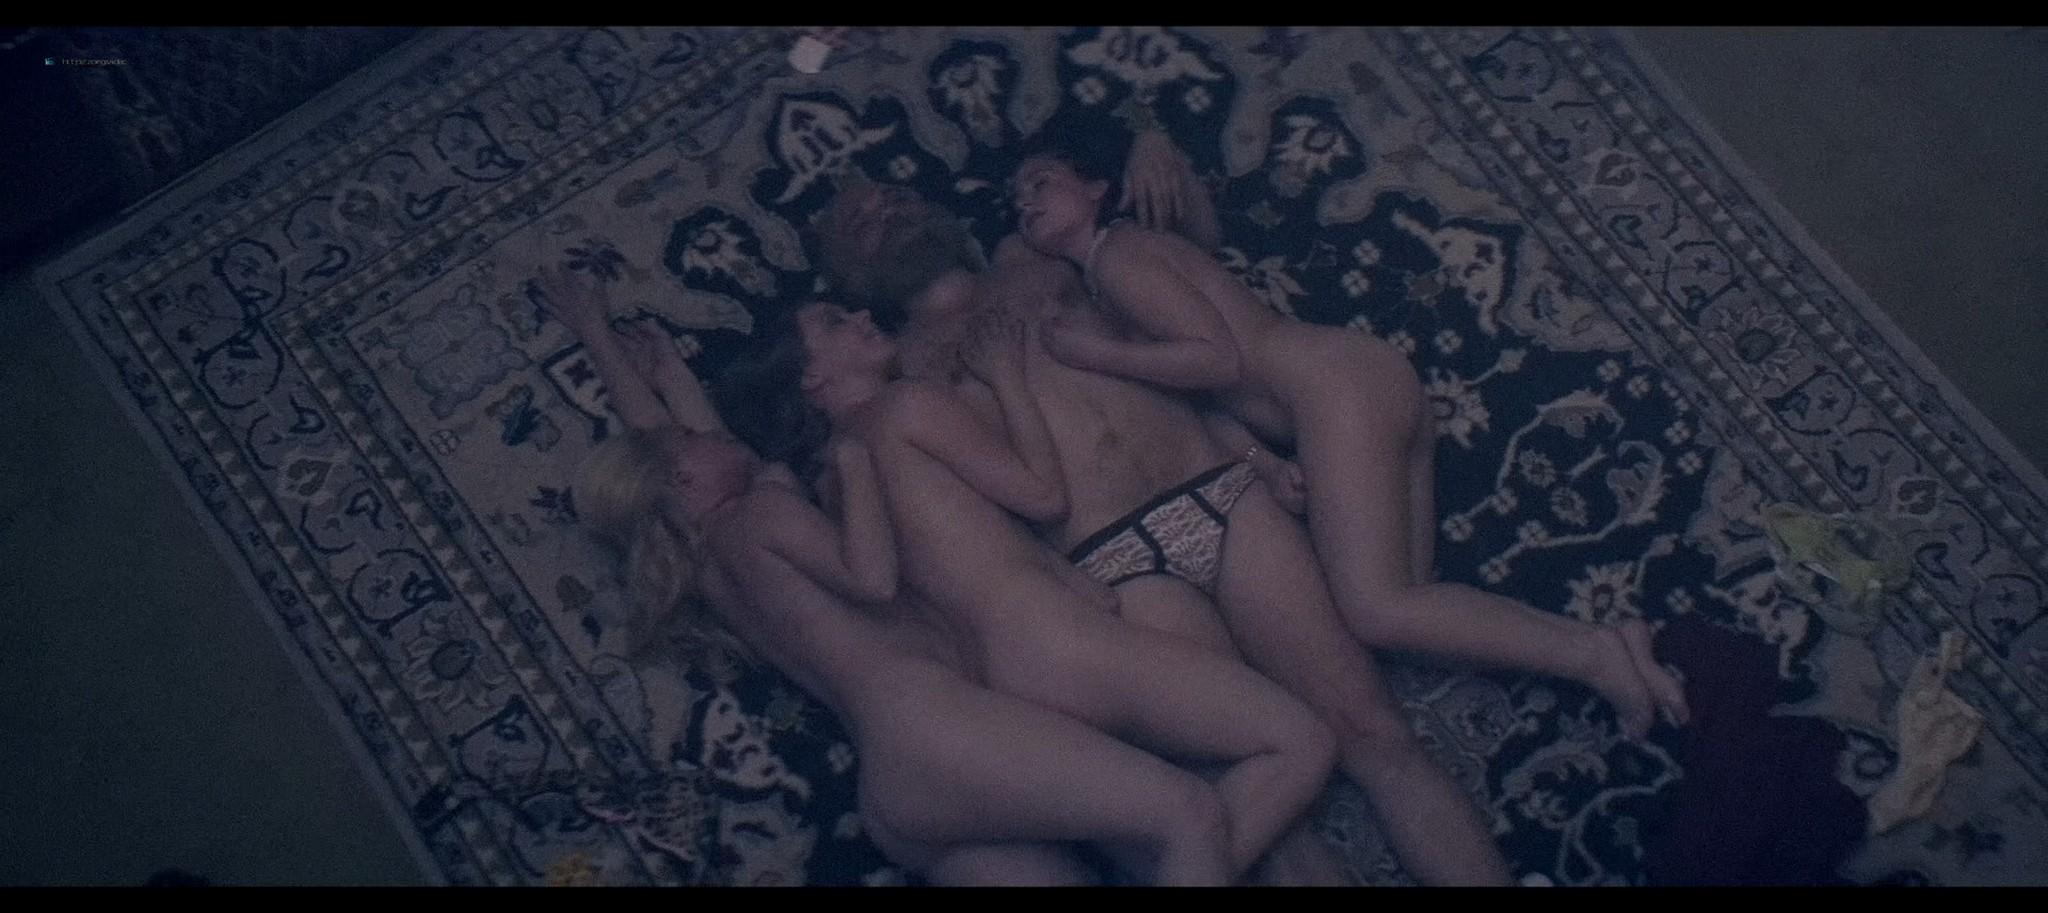 Camilla Cornelia Lehmann nude Sarahsita Lassen, nude and explicit body parts - Spies Og Glistrup (DK-2013) HD 1080p BluRay (18)